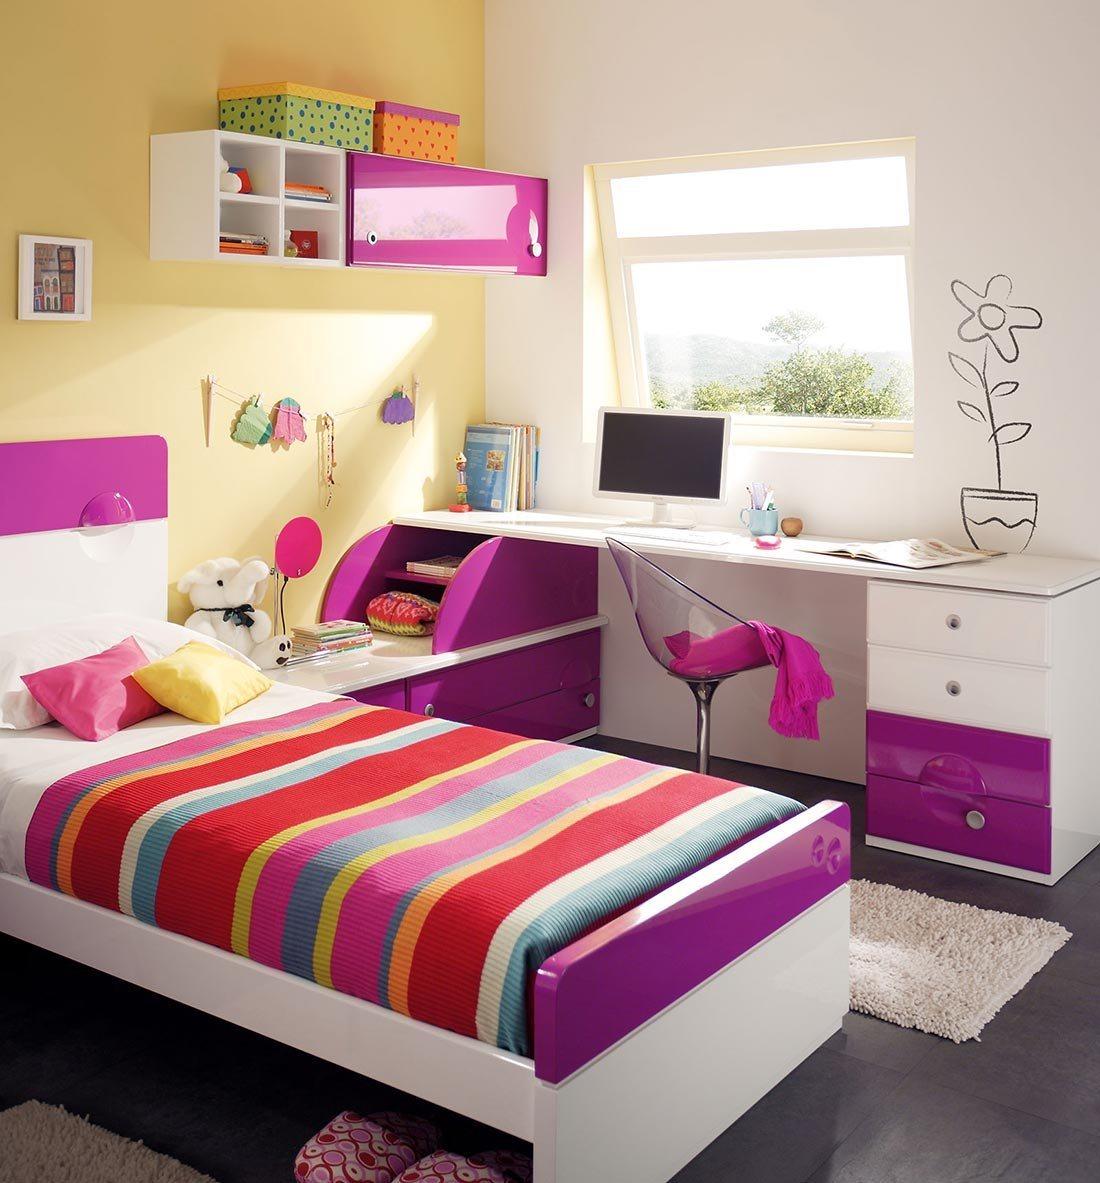 Quartos juvenis da empresa juraco decora o da casa for Opciones para decorar un cuarto